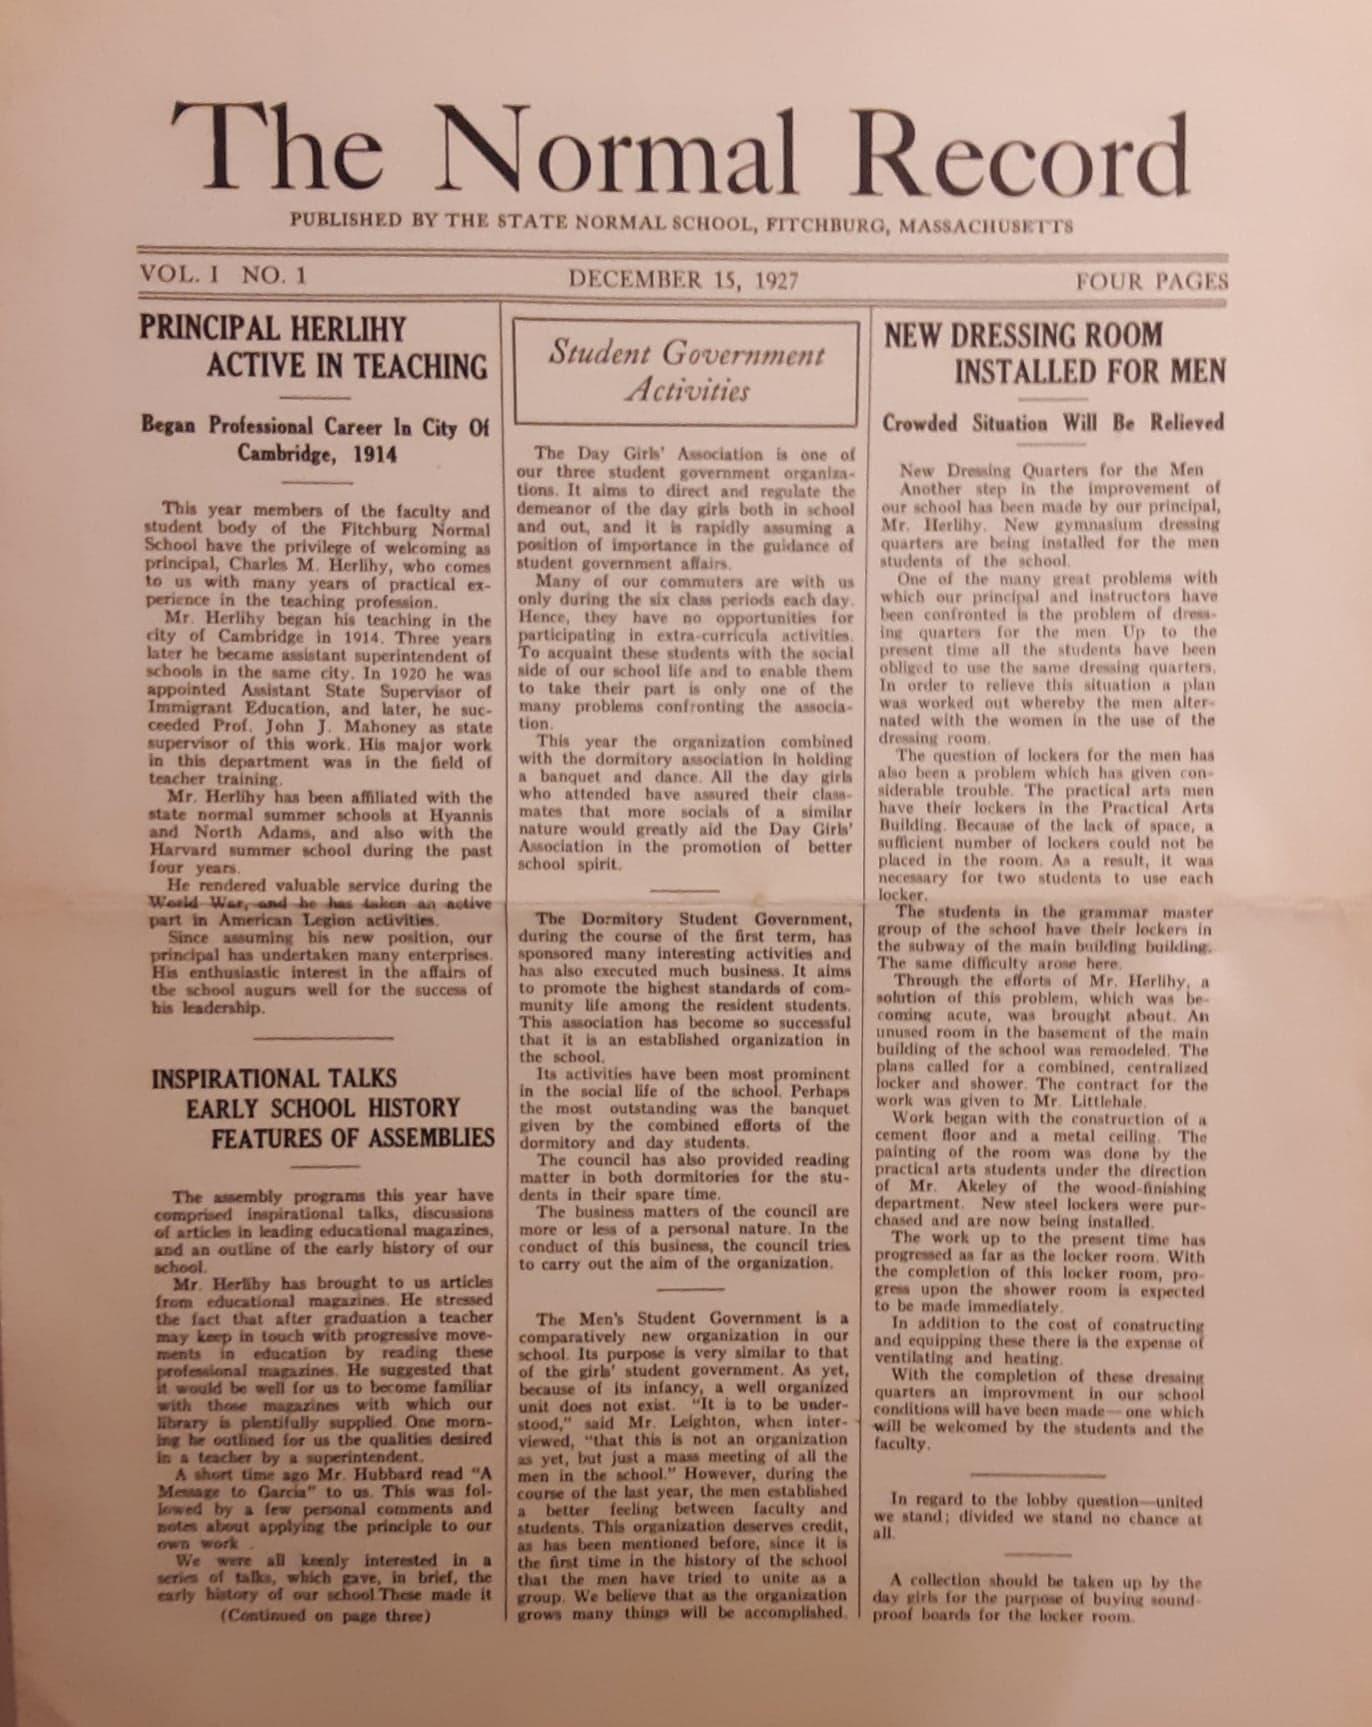 The Normal Record Vol 1 No 1